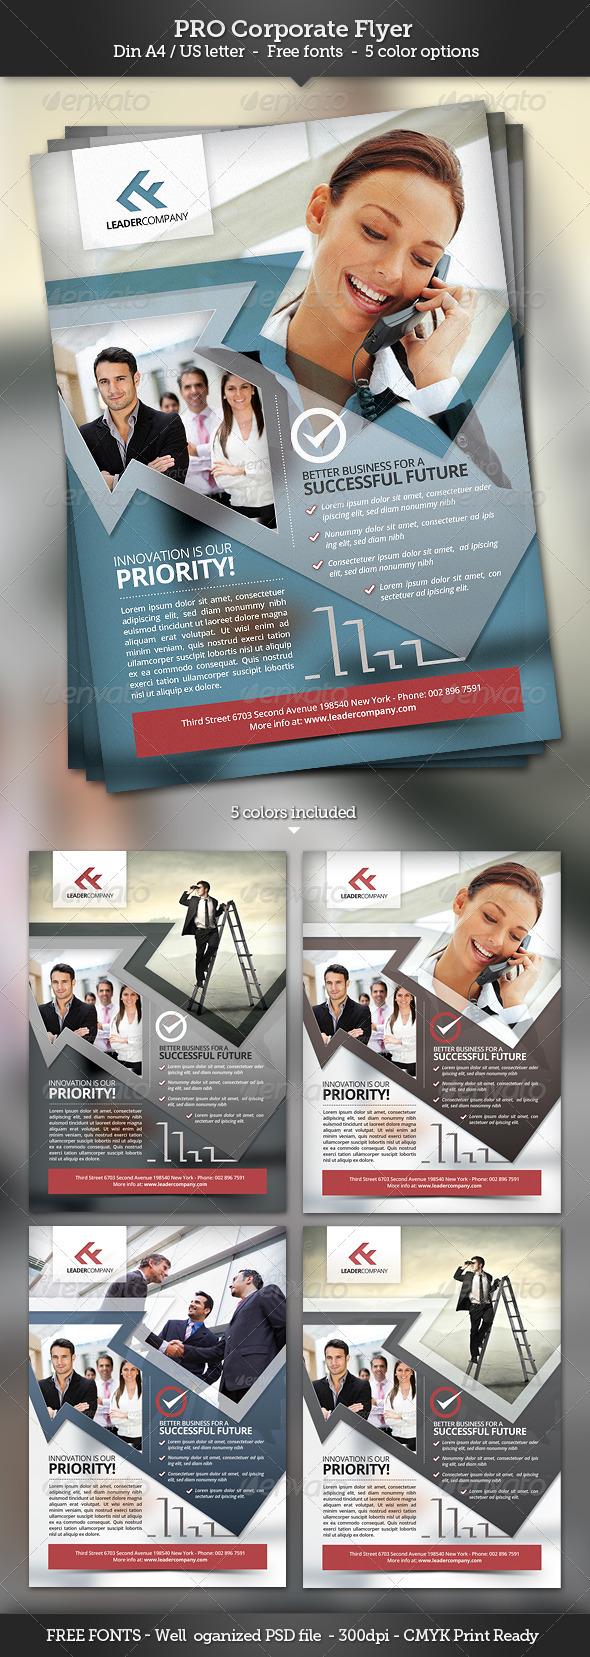 GraphicRiver Pro Corporate Flyer Template 3168398